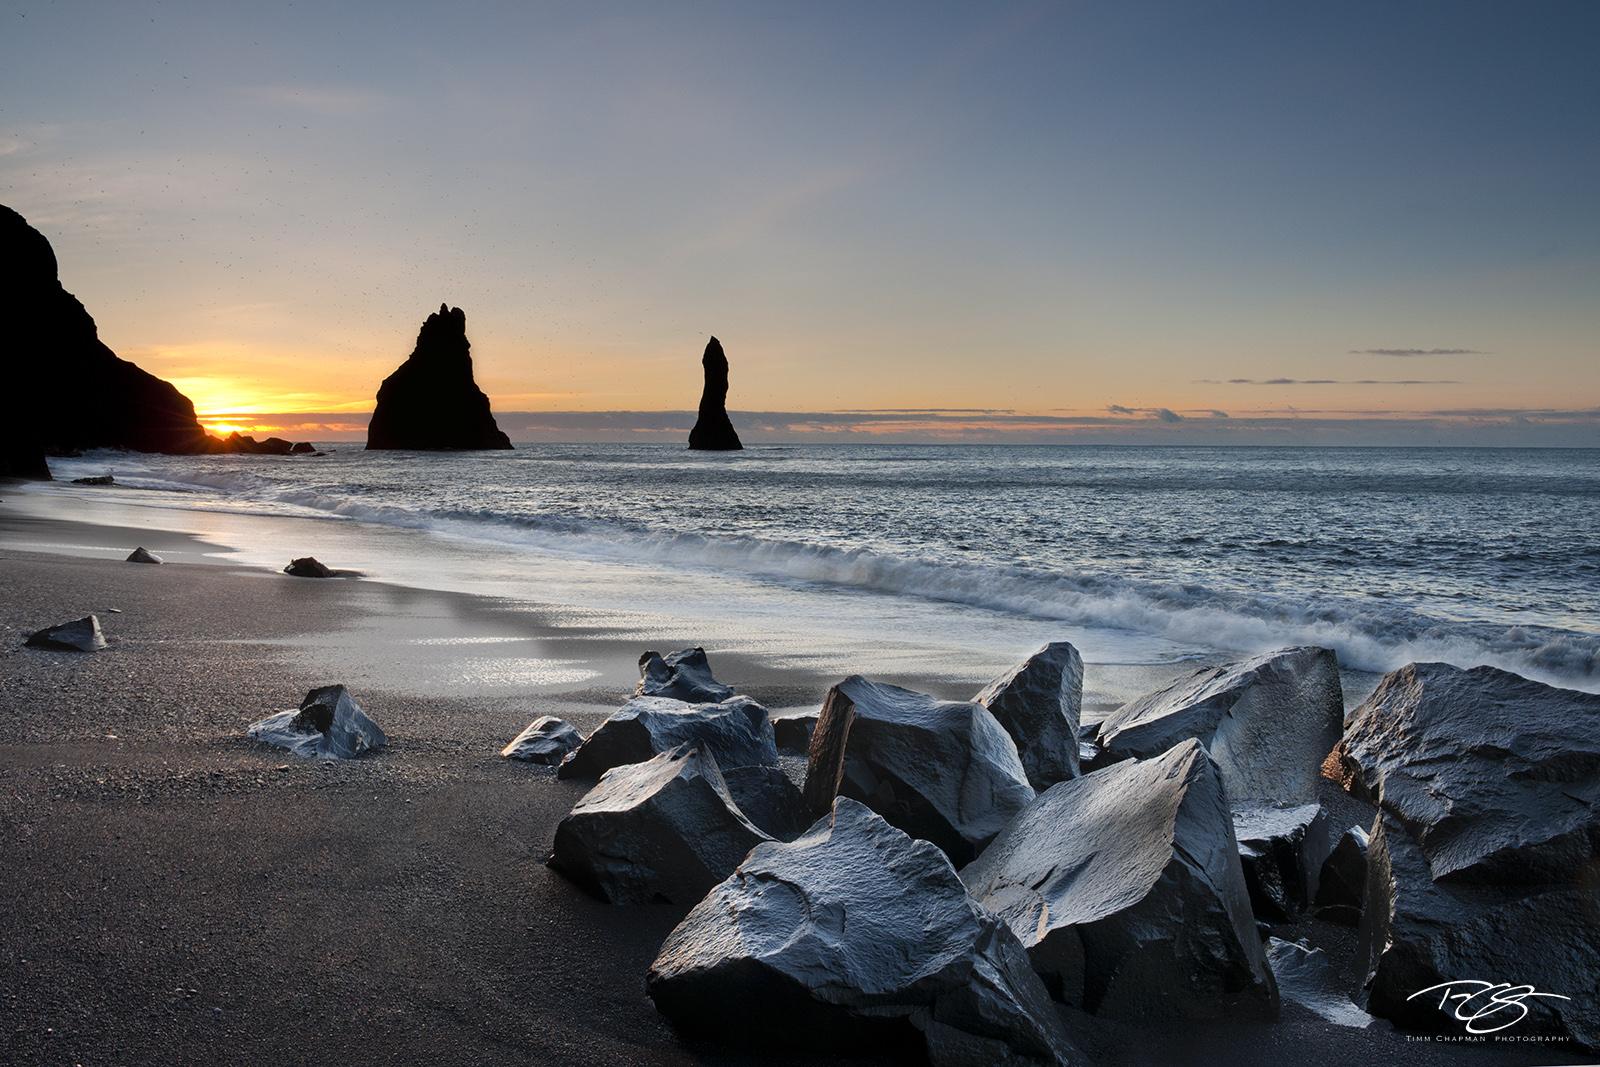 iceland, vik, Reynisfjara, Myrdalur, South Coast, black pebble beach, black sand, basalt, sunrise, sea stacks, Reynisdrangar, black rocks, mist, salt spray, morning mist, silhouette, shore, beach, photo